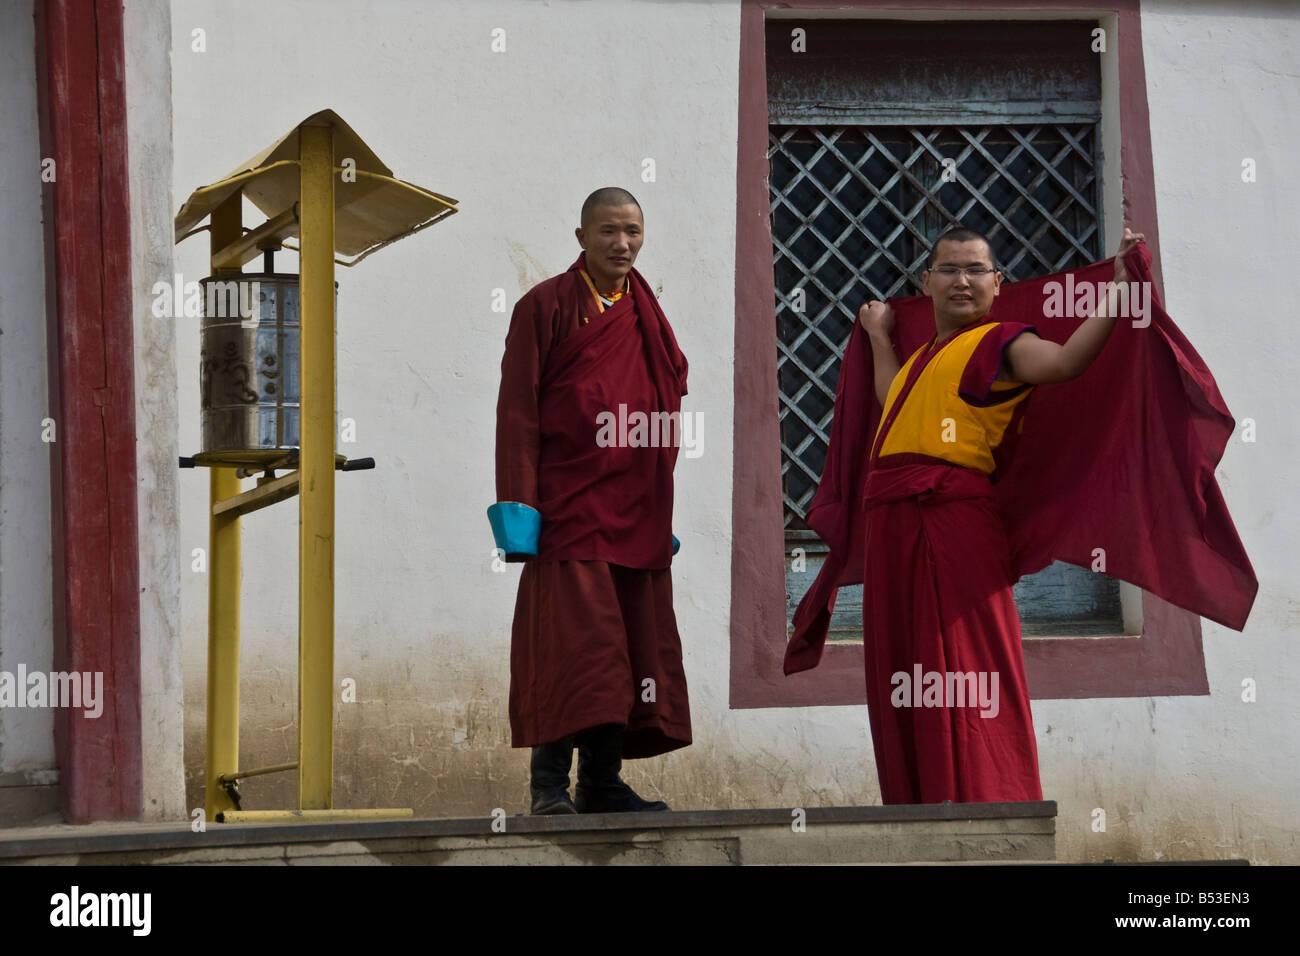 Buddhist Monks at the Gandan Khiid Monastery UlaanBaatar Mongolia - Stock Image